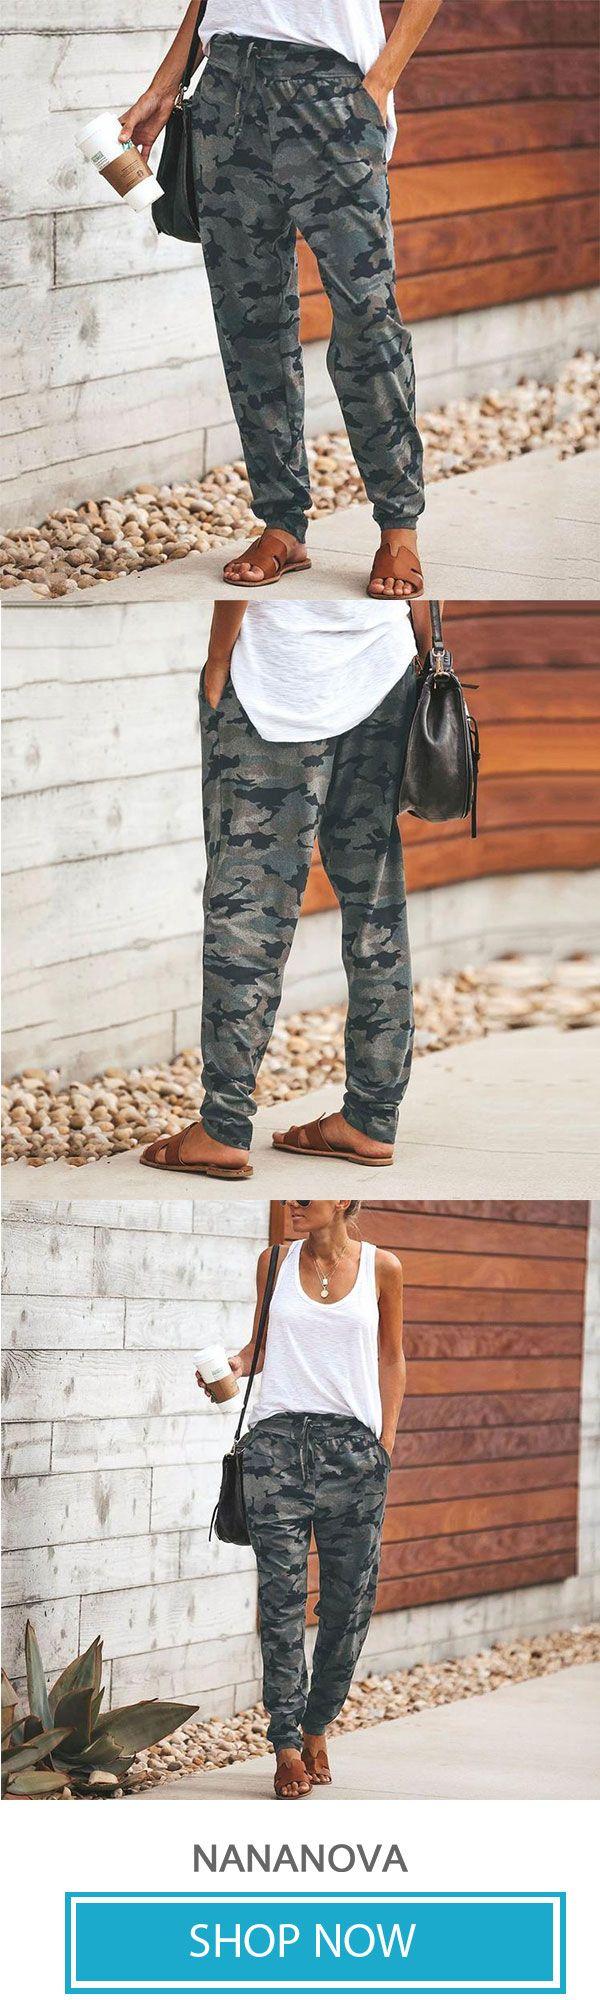 Fashion Camouflage Slim Casual Pants 2